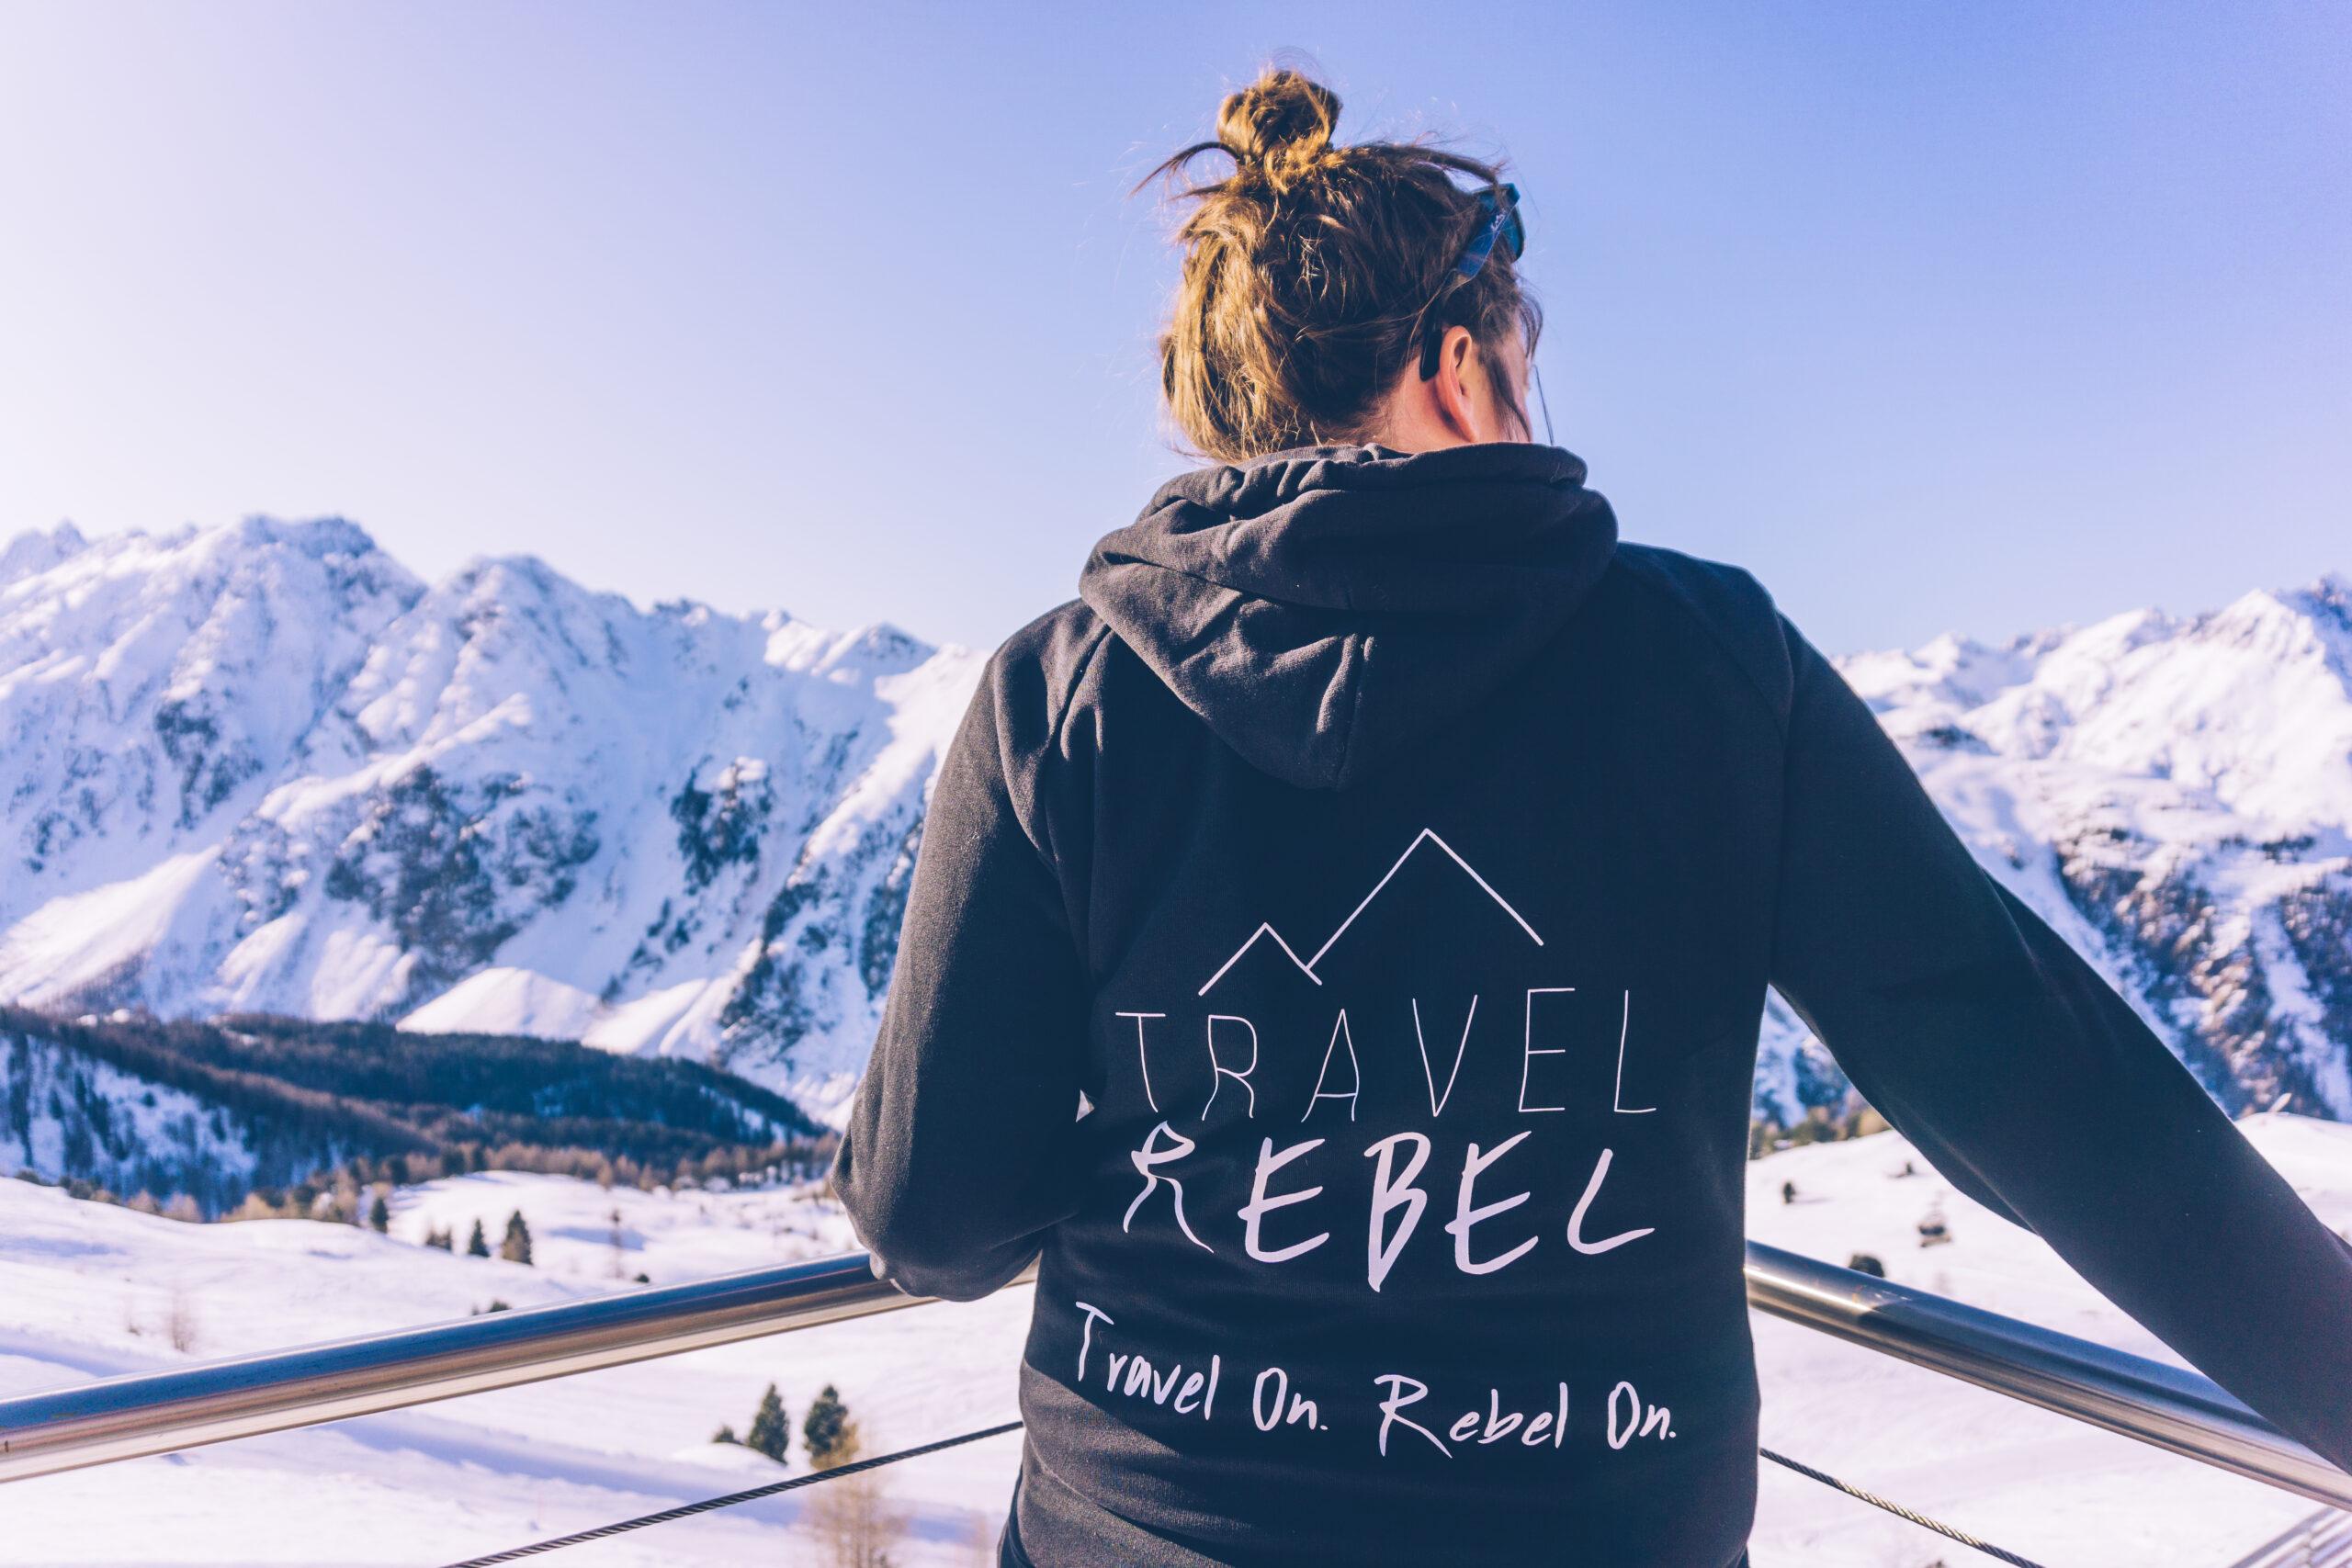 Topnotch ski experience - Ischgl